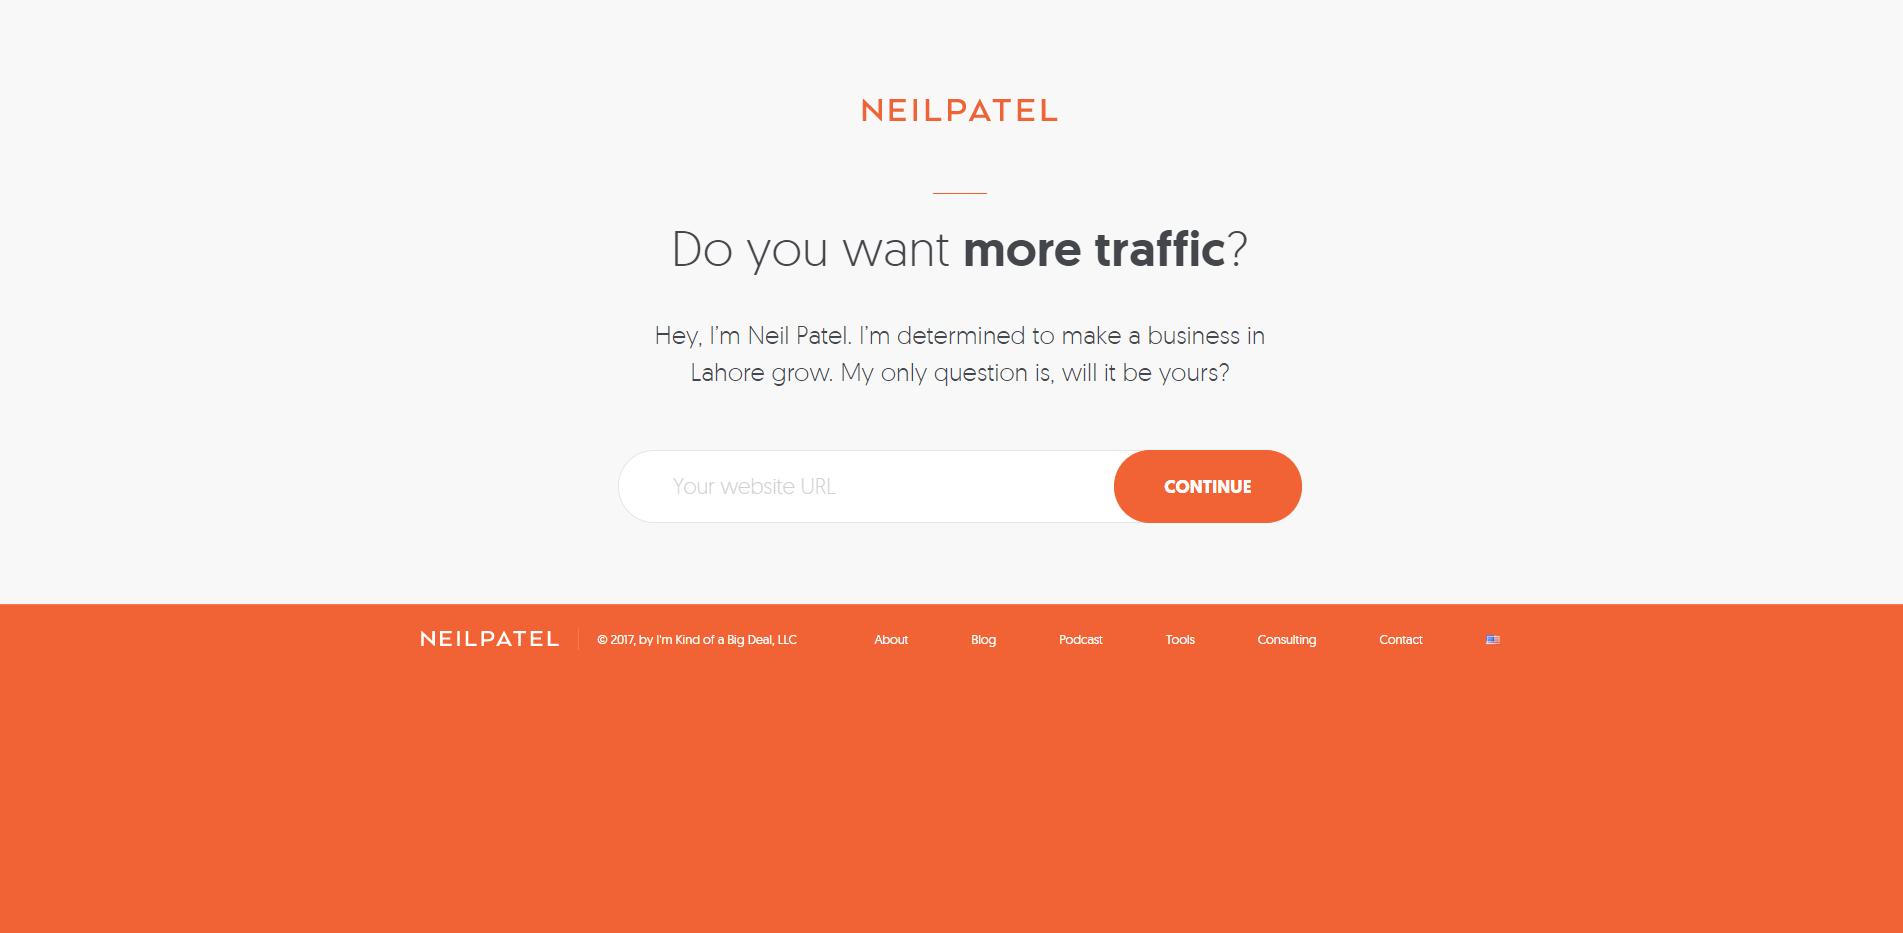 Neil Patel Click Through Landing Page step 1